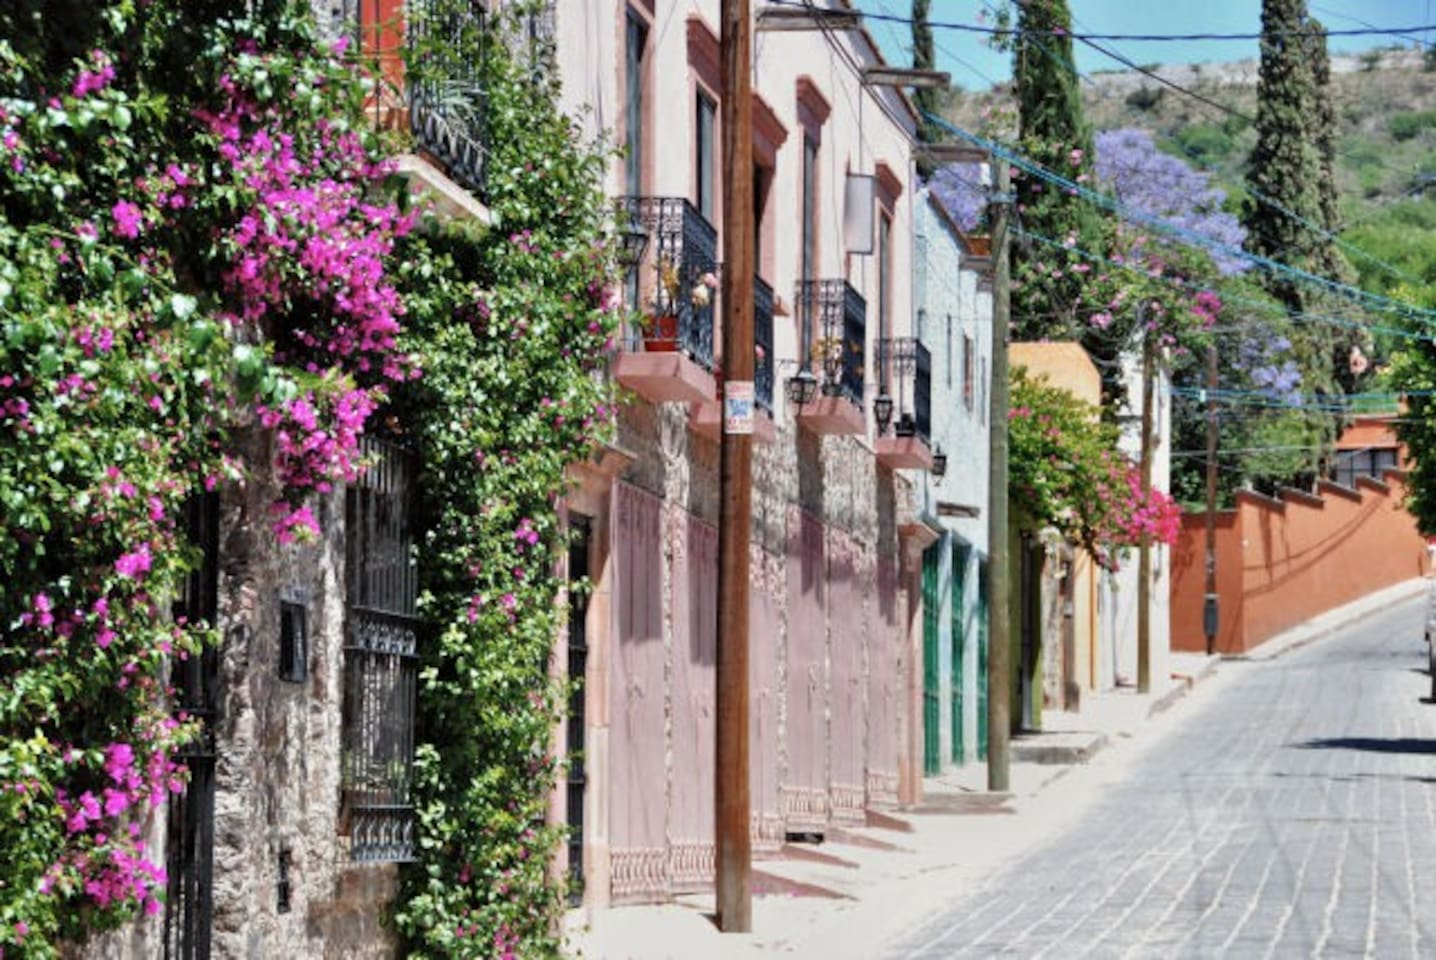 Colonia Guadiana, Casa Ana Maria